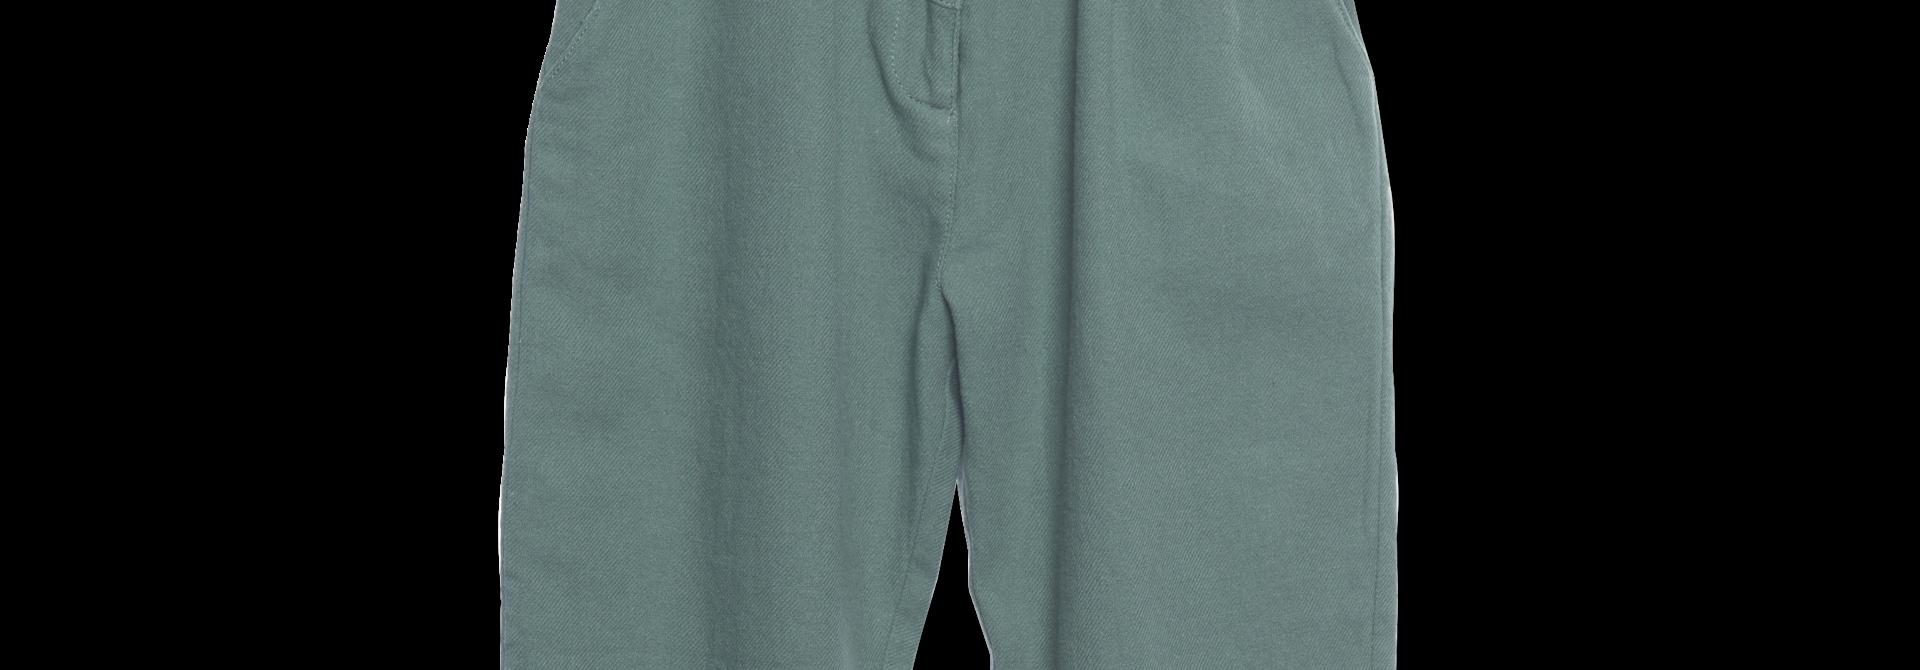 Baggy pants Fern